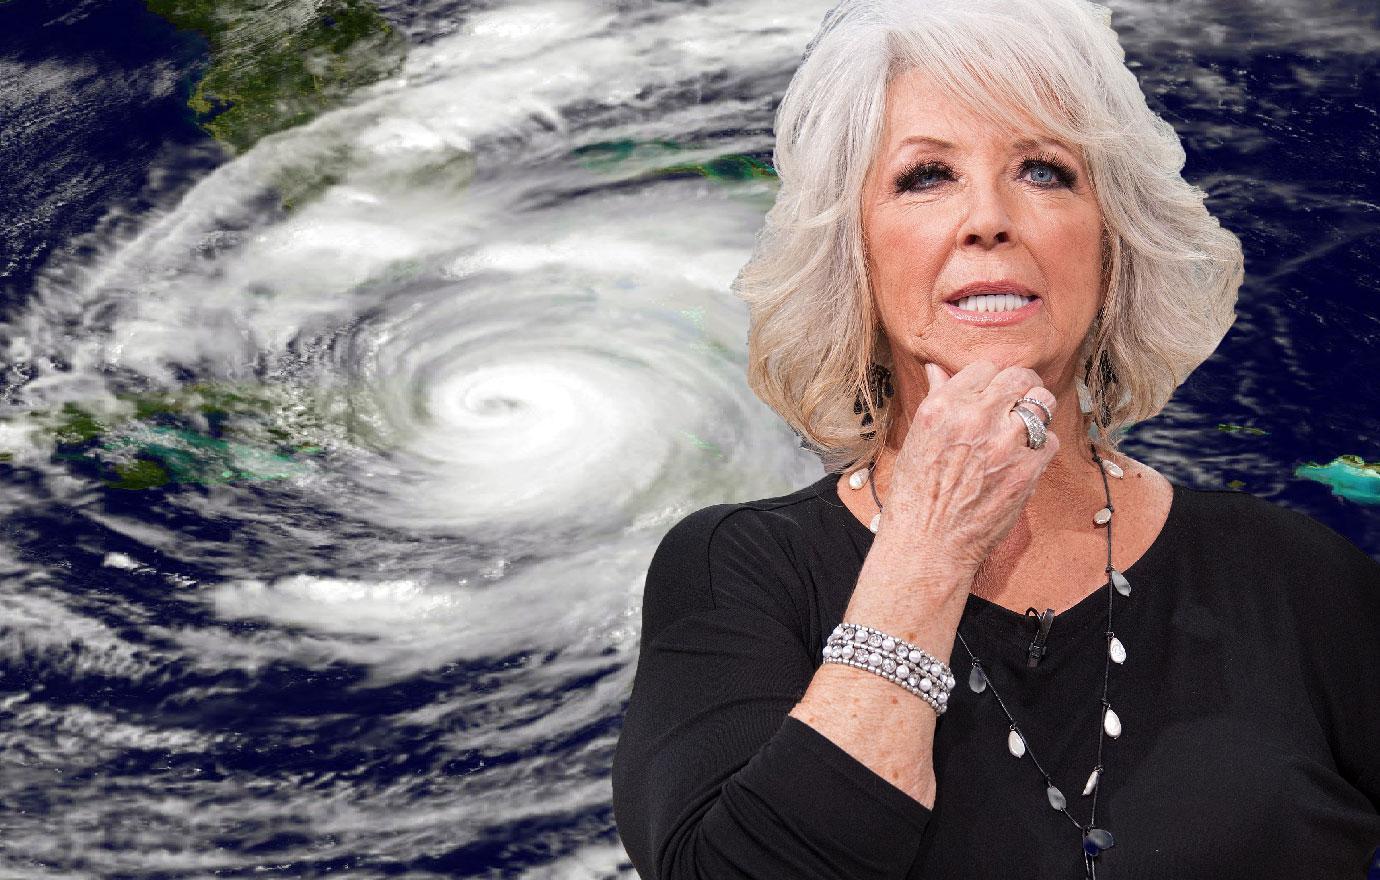 Paula Deen Savannah Resort In Danger Hurricane Irma